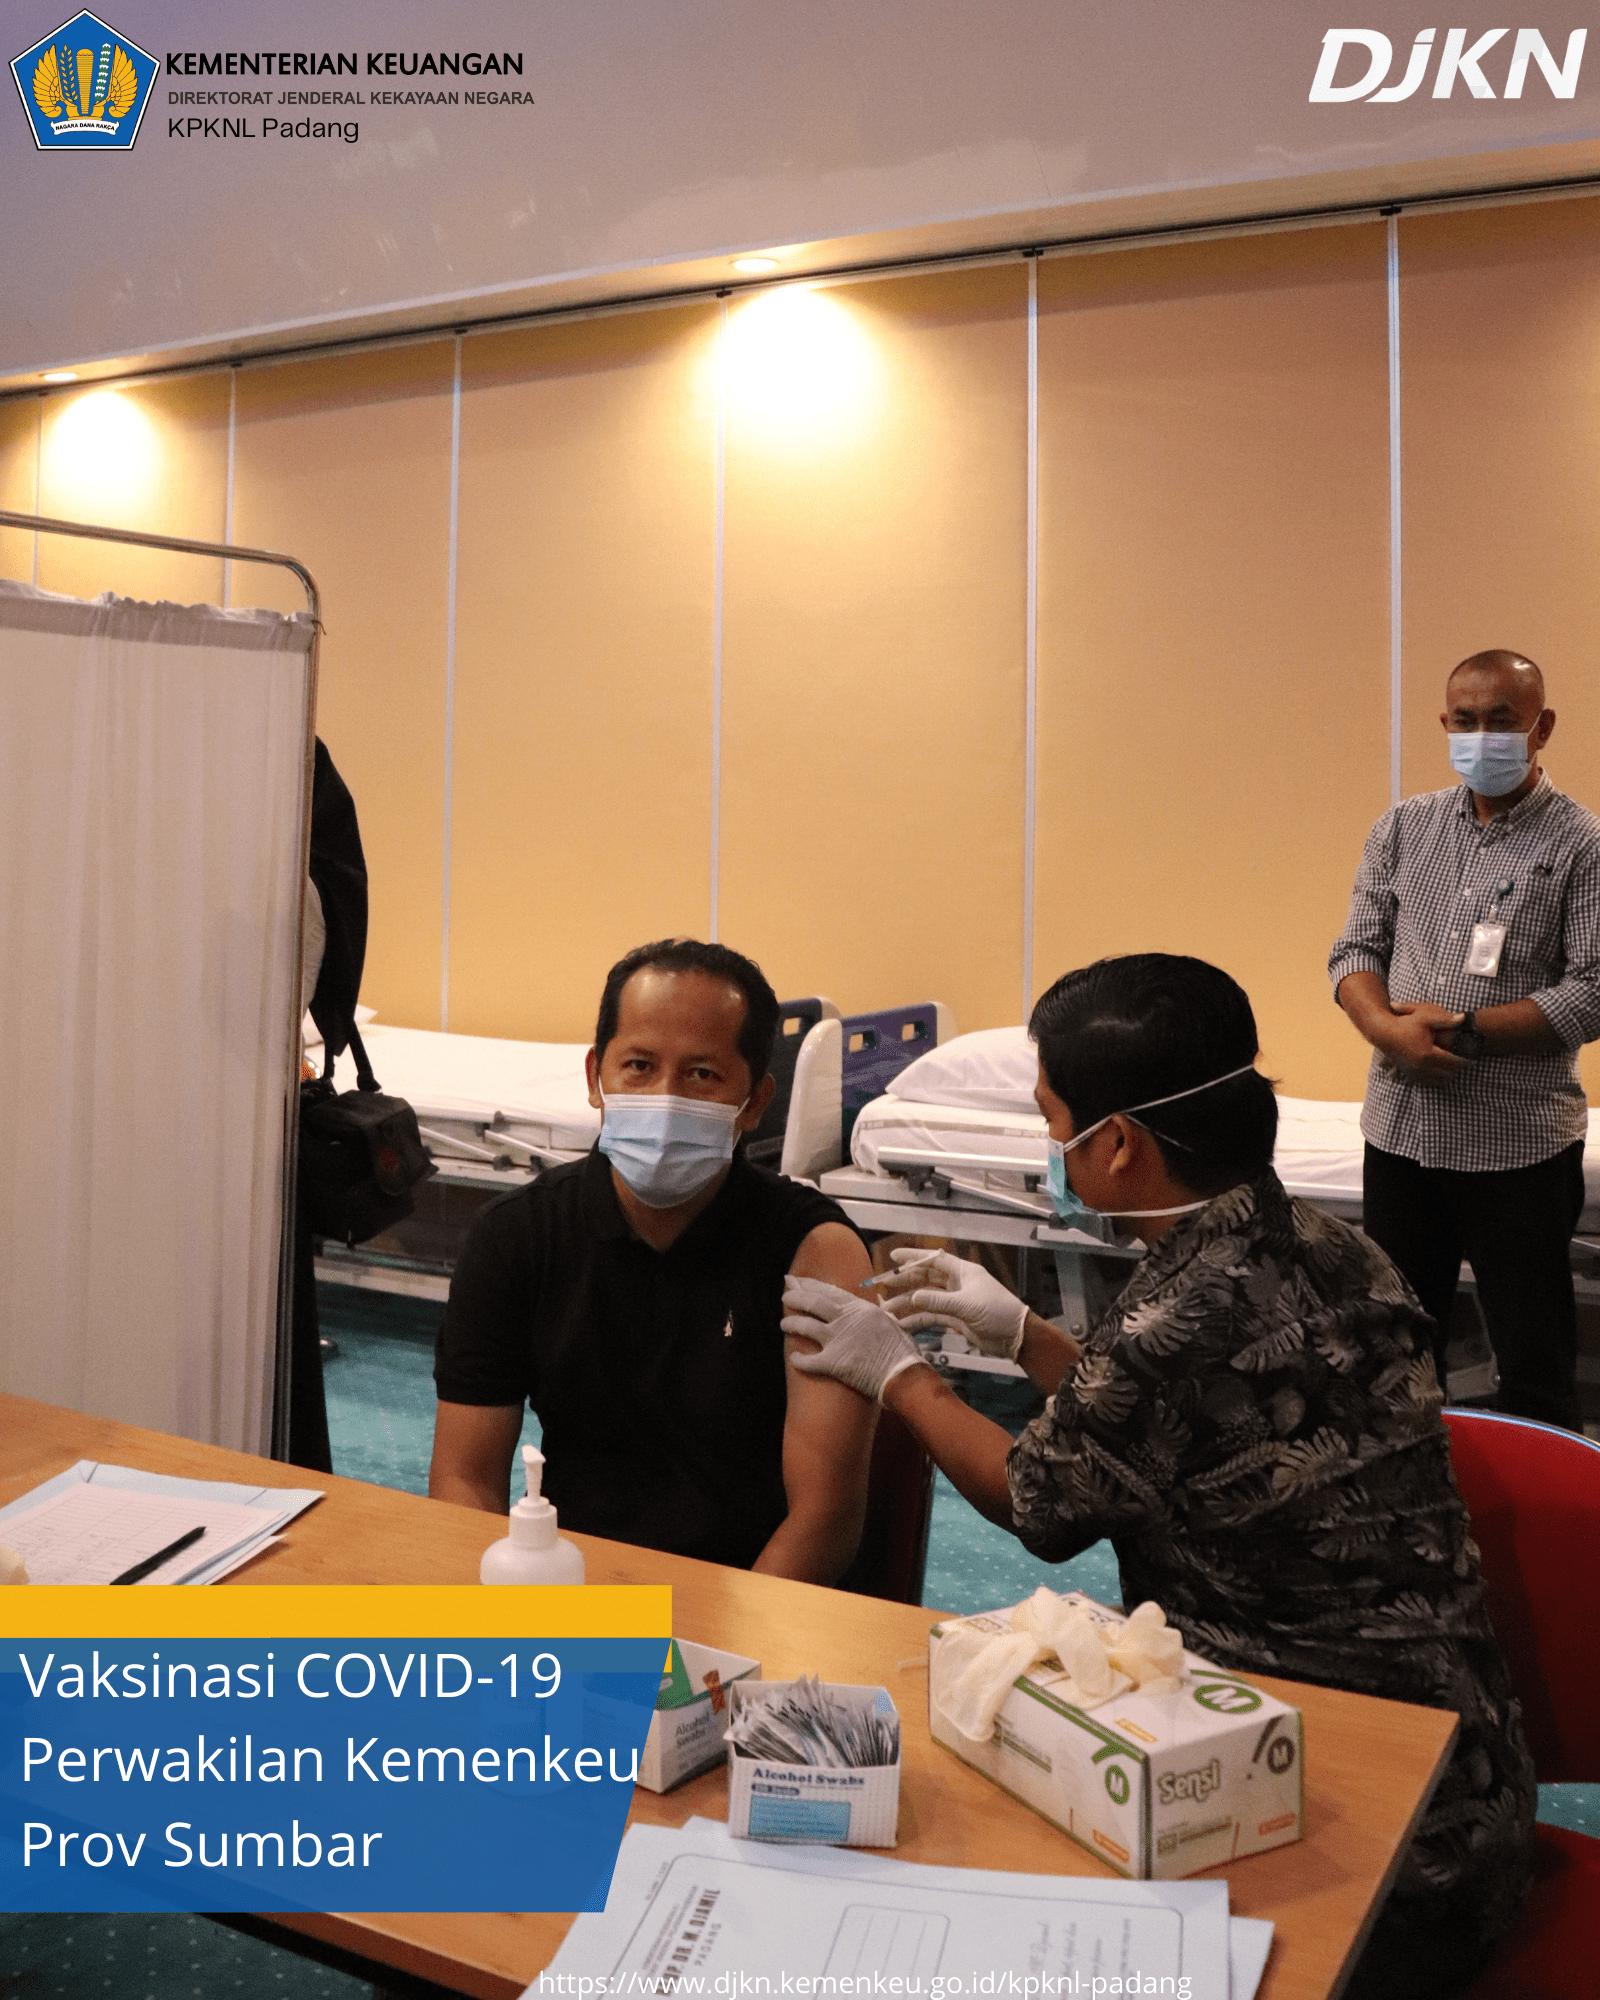 Vaksinasi Covid-19 Perwakilan Kemenkeu Prov Sumatera Barat